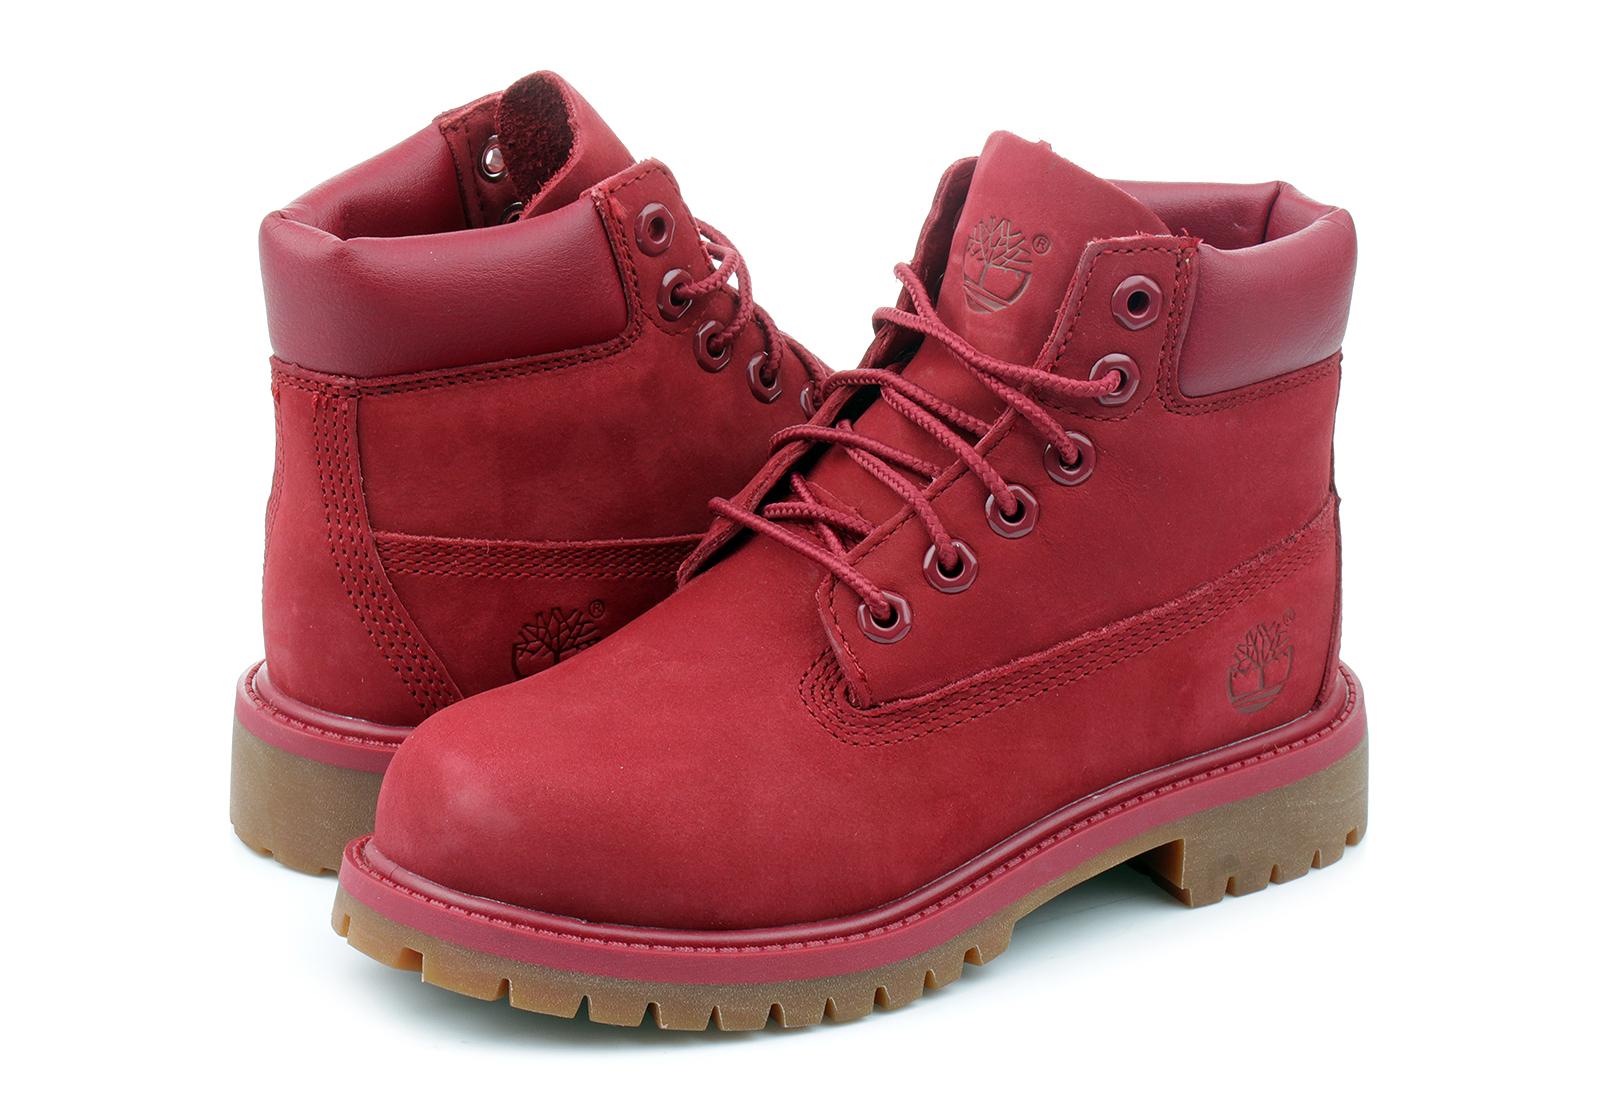 Timberland Boty#Farmářky 6in Prem Boot